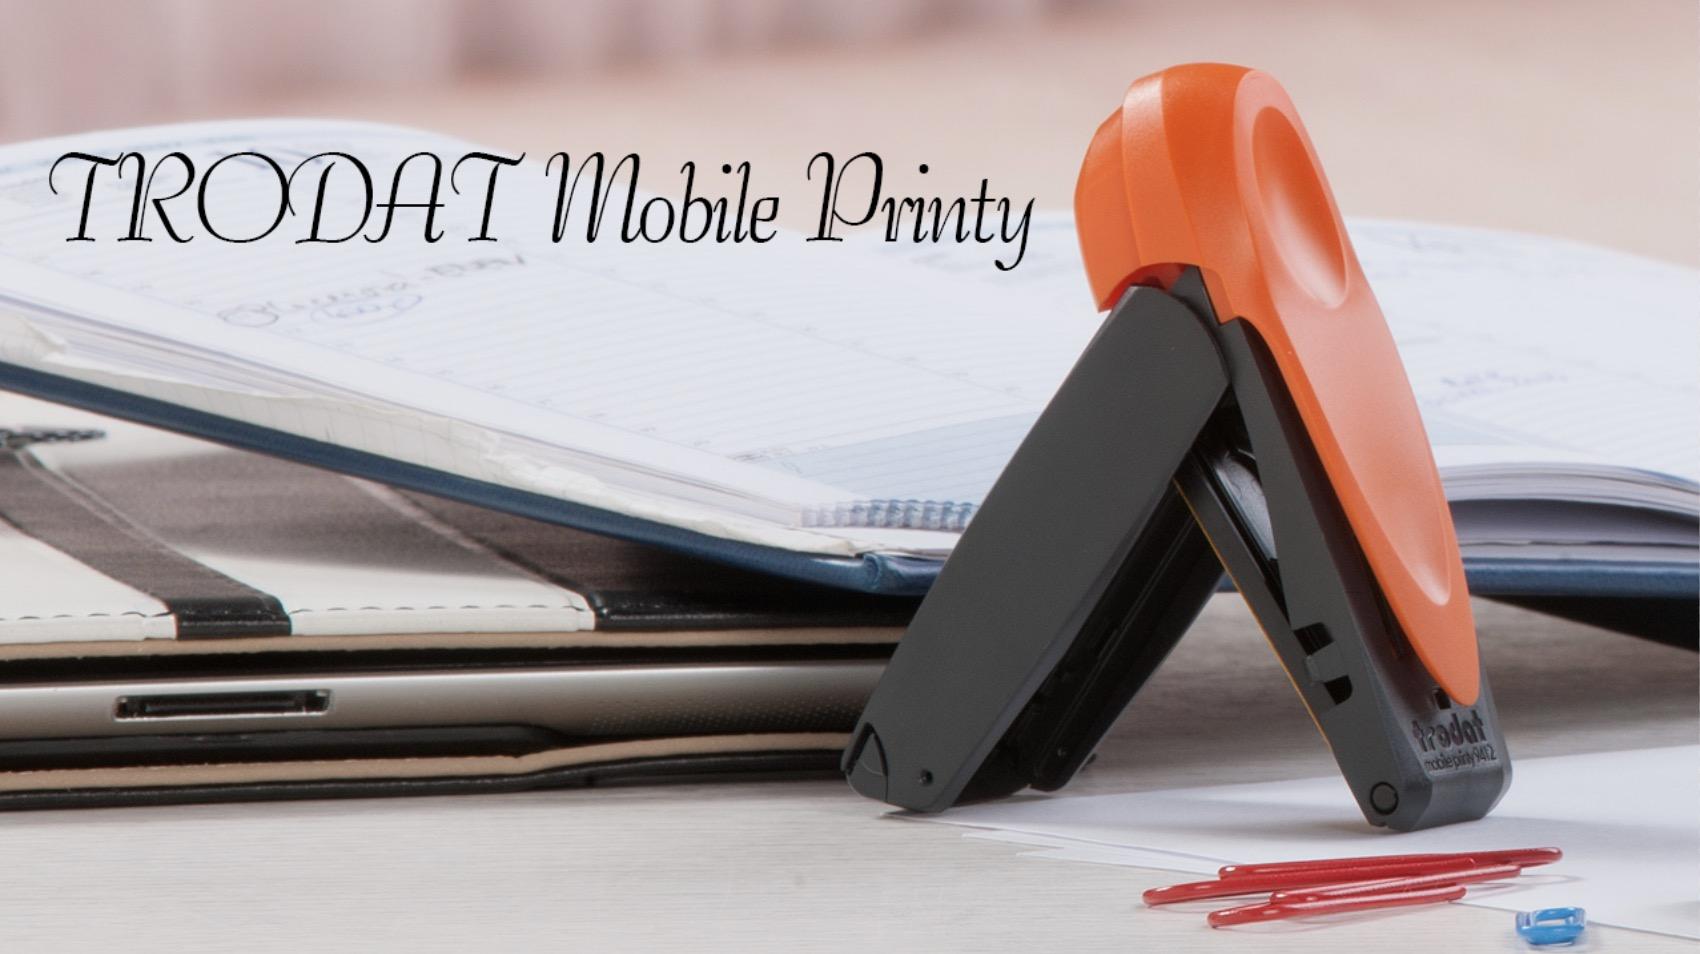 Trodat Mobile Printy